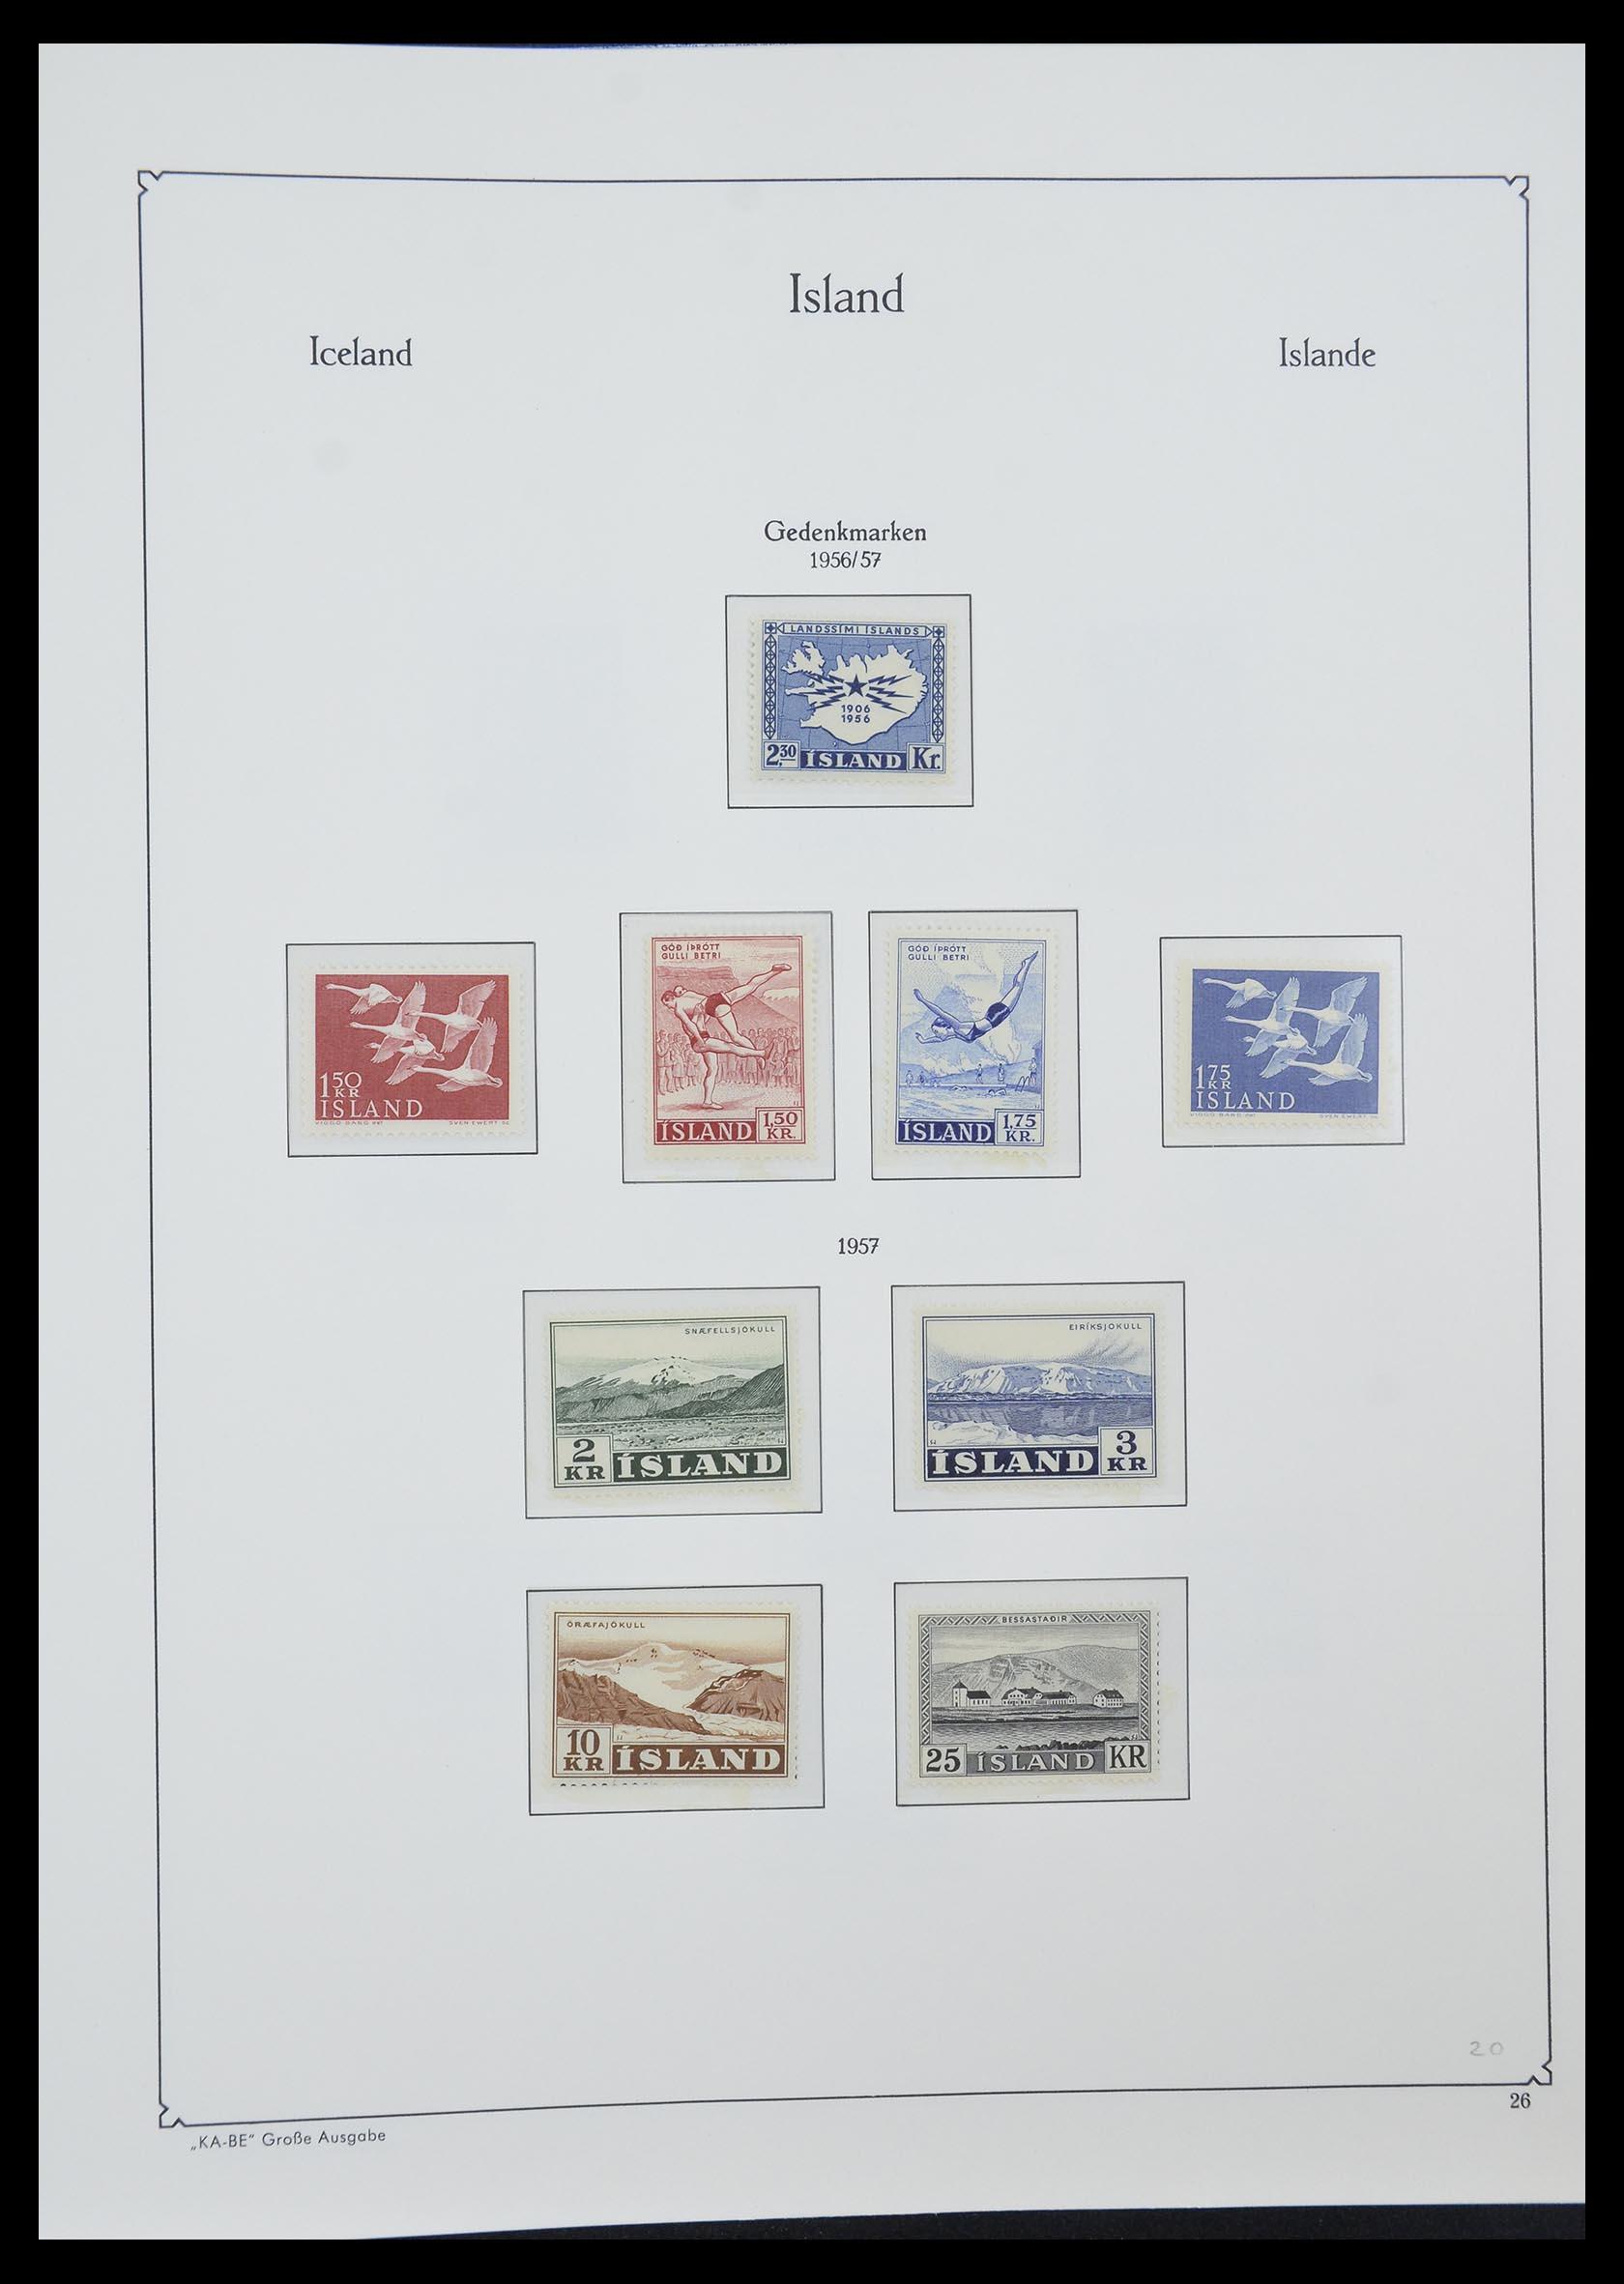 33185 009 - Postzegelverzameling 33184 Finland 1856-1990.